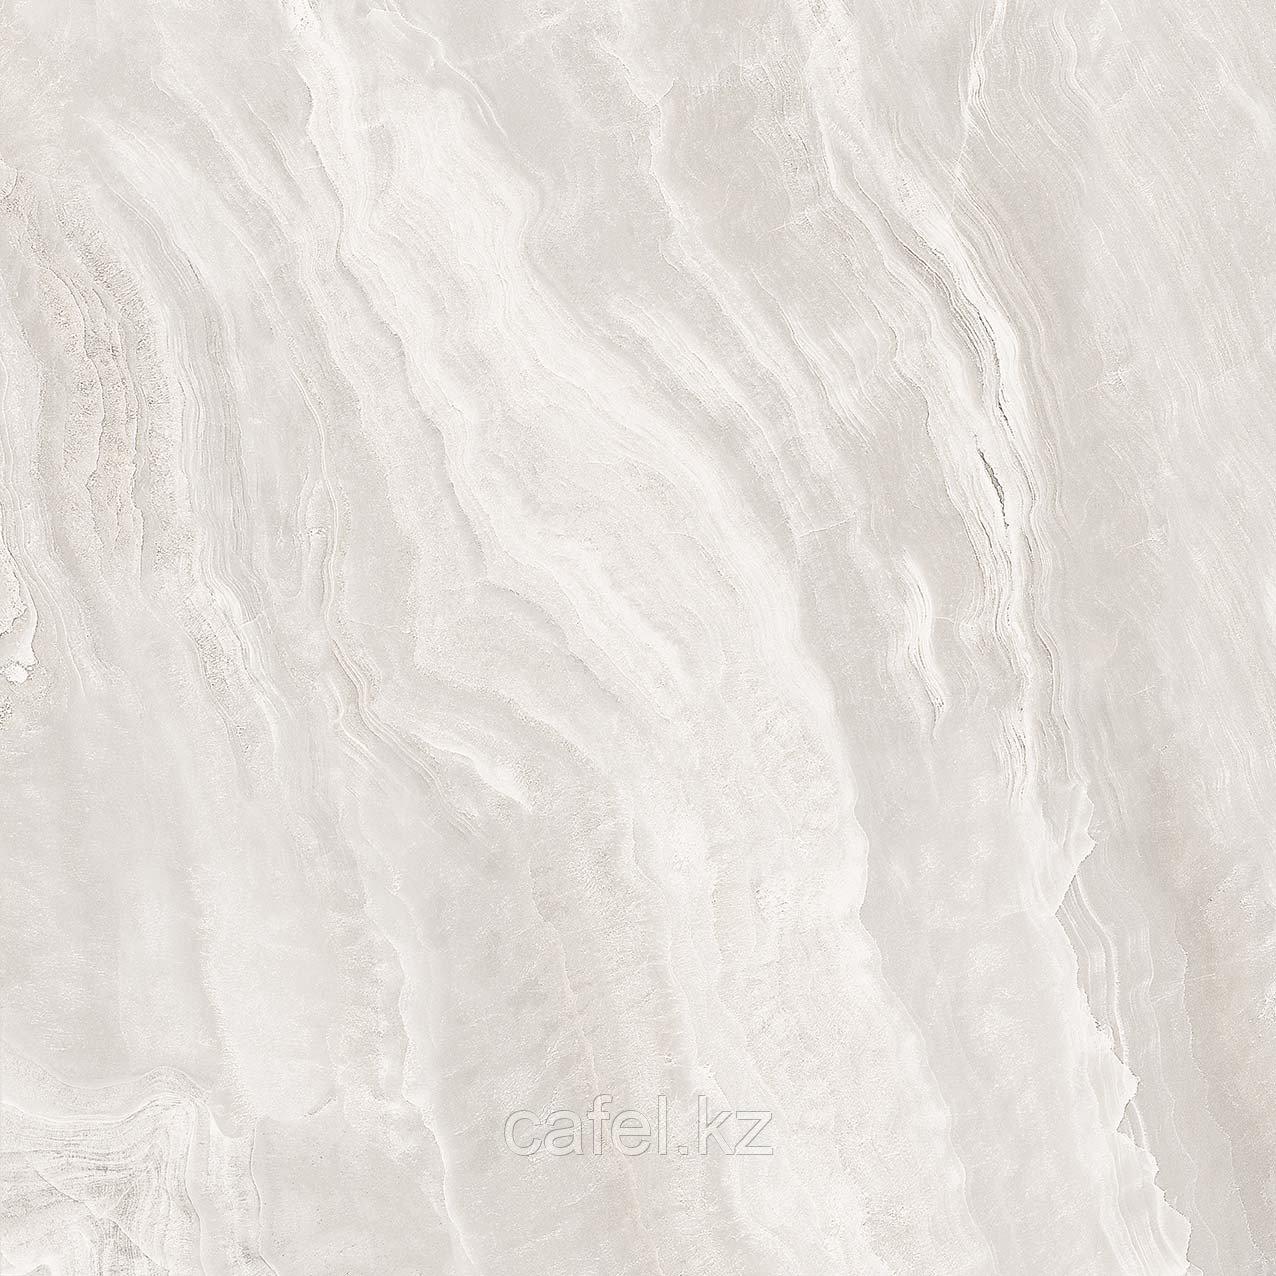 Керамогранит 45х45 Александрия | Alexandria серый